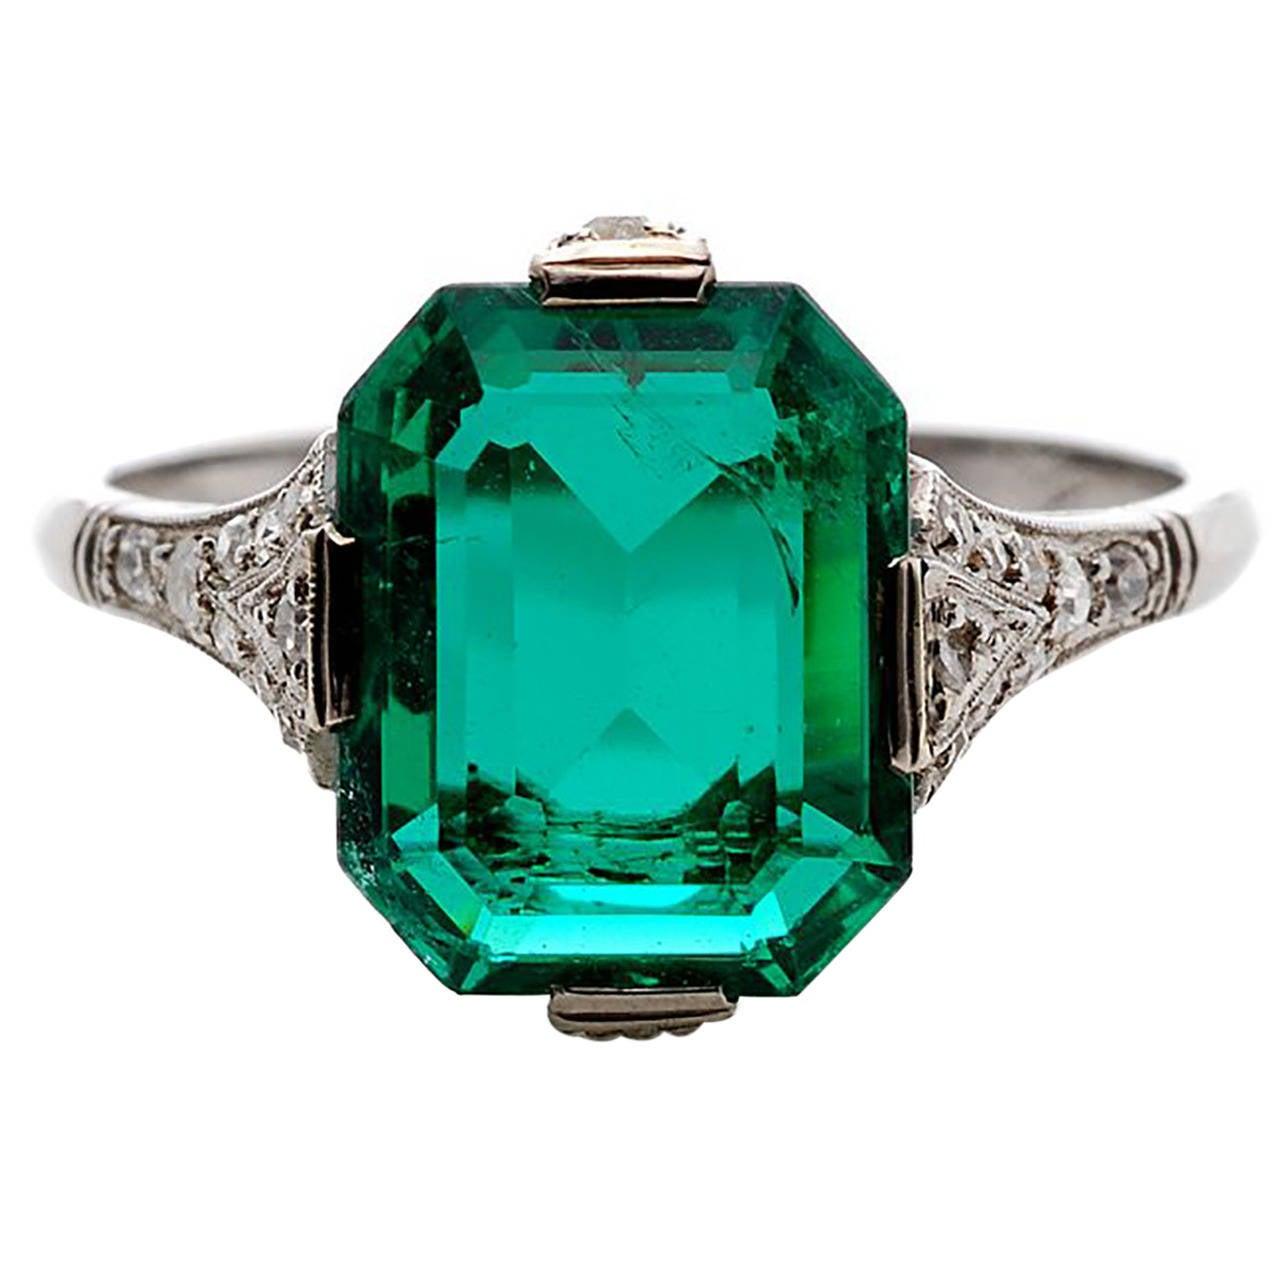 Art Deco Colombian Unenhanced 3 Carat Emerald Ring At 1stdibs